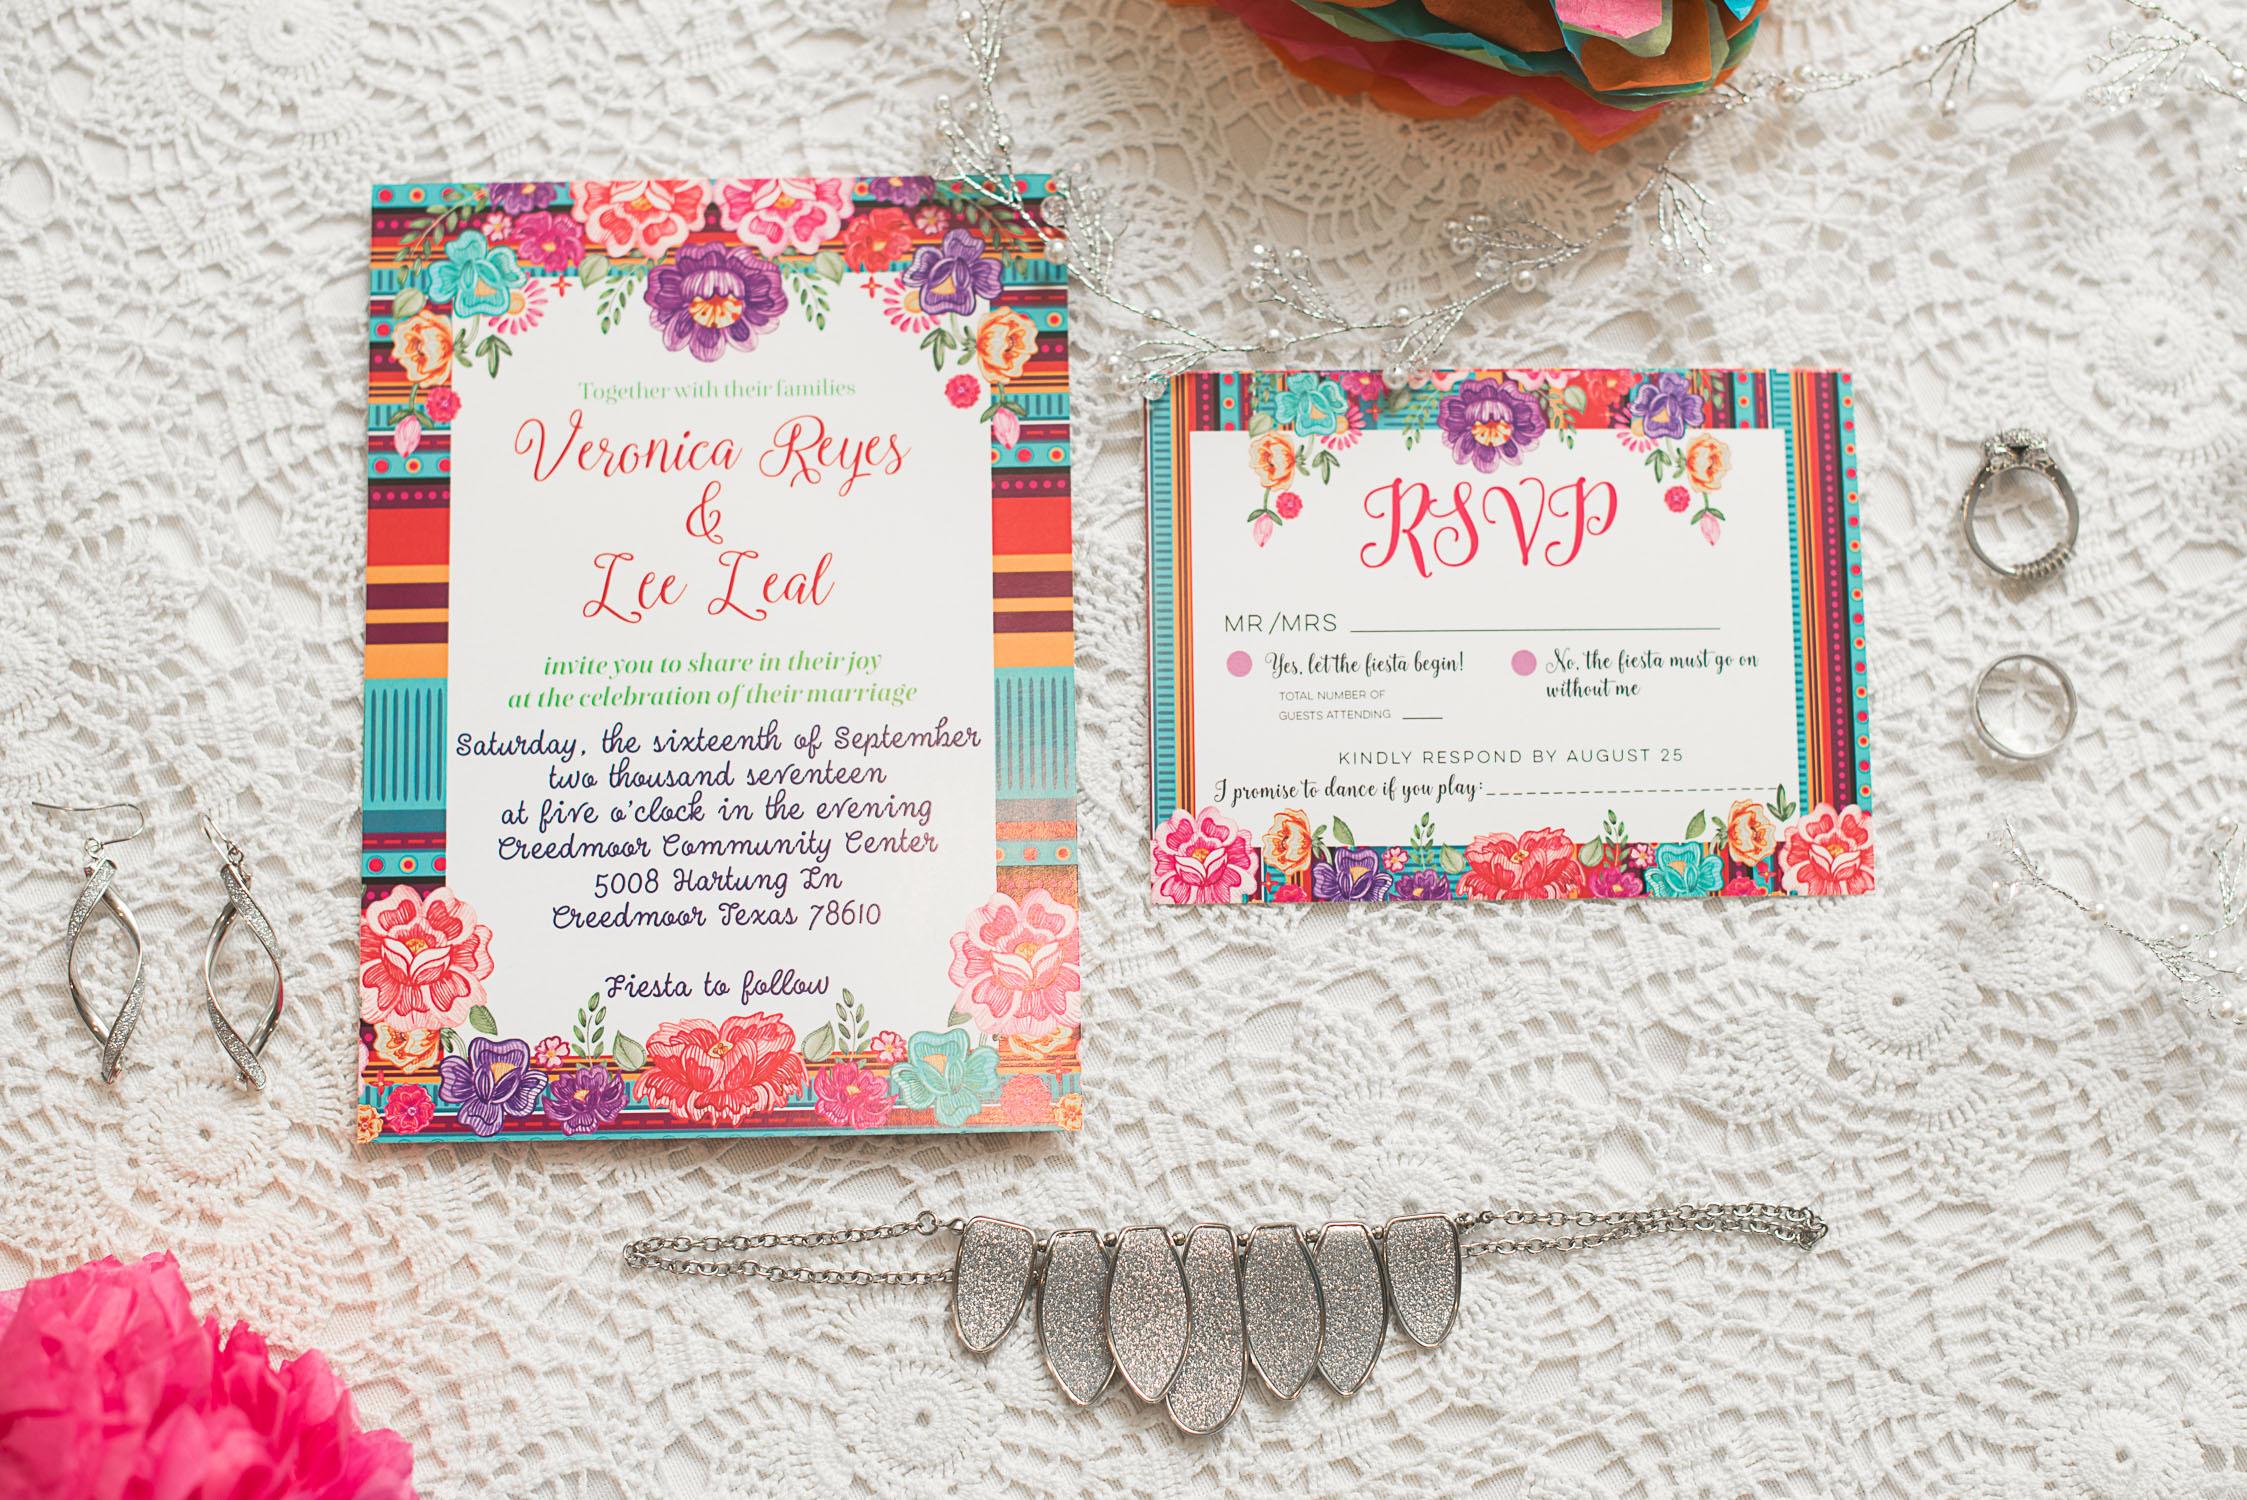 Leal Wedding Mira Visu Photography-5.jpg